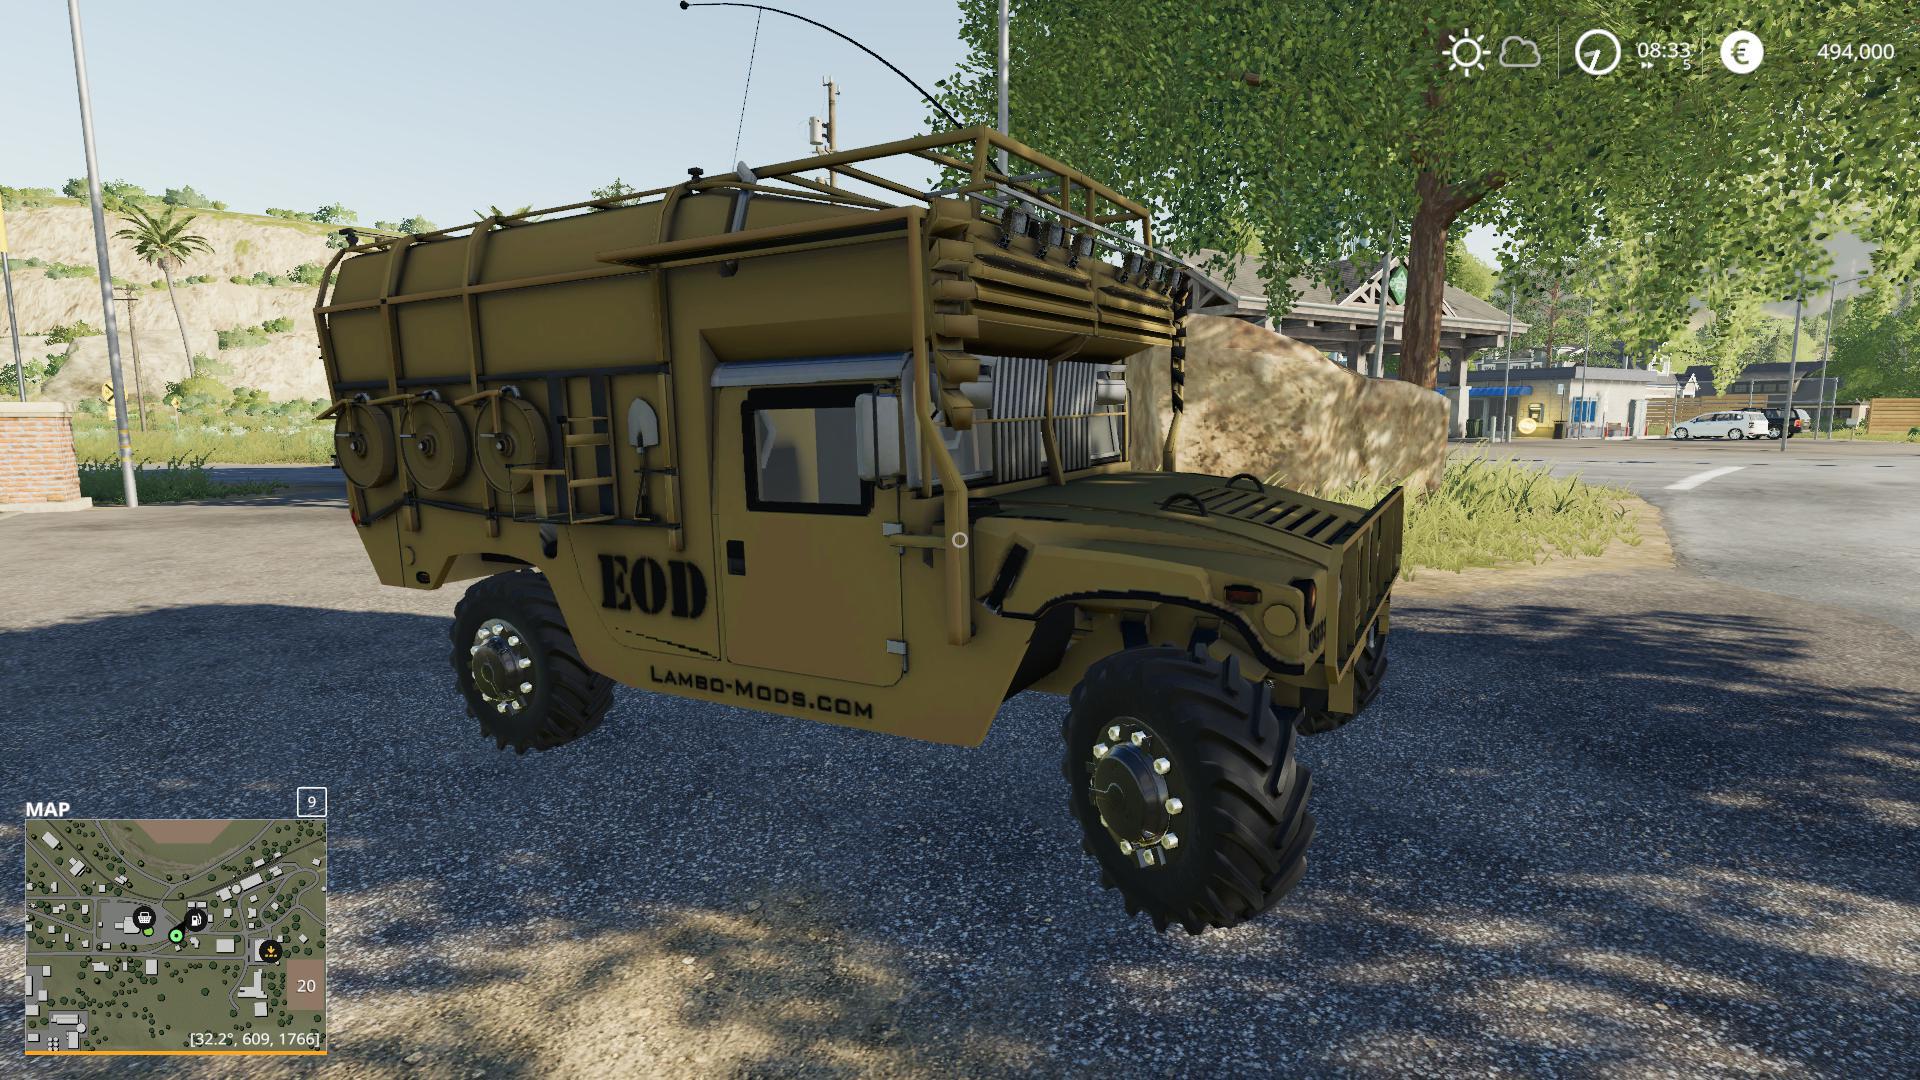 Army humvee v 1.0